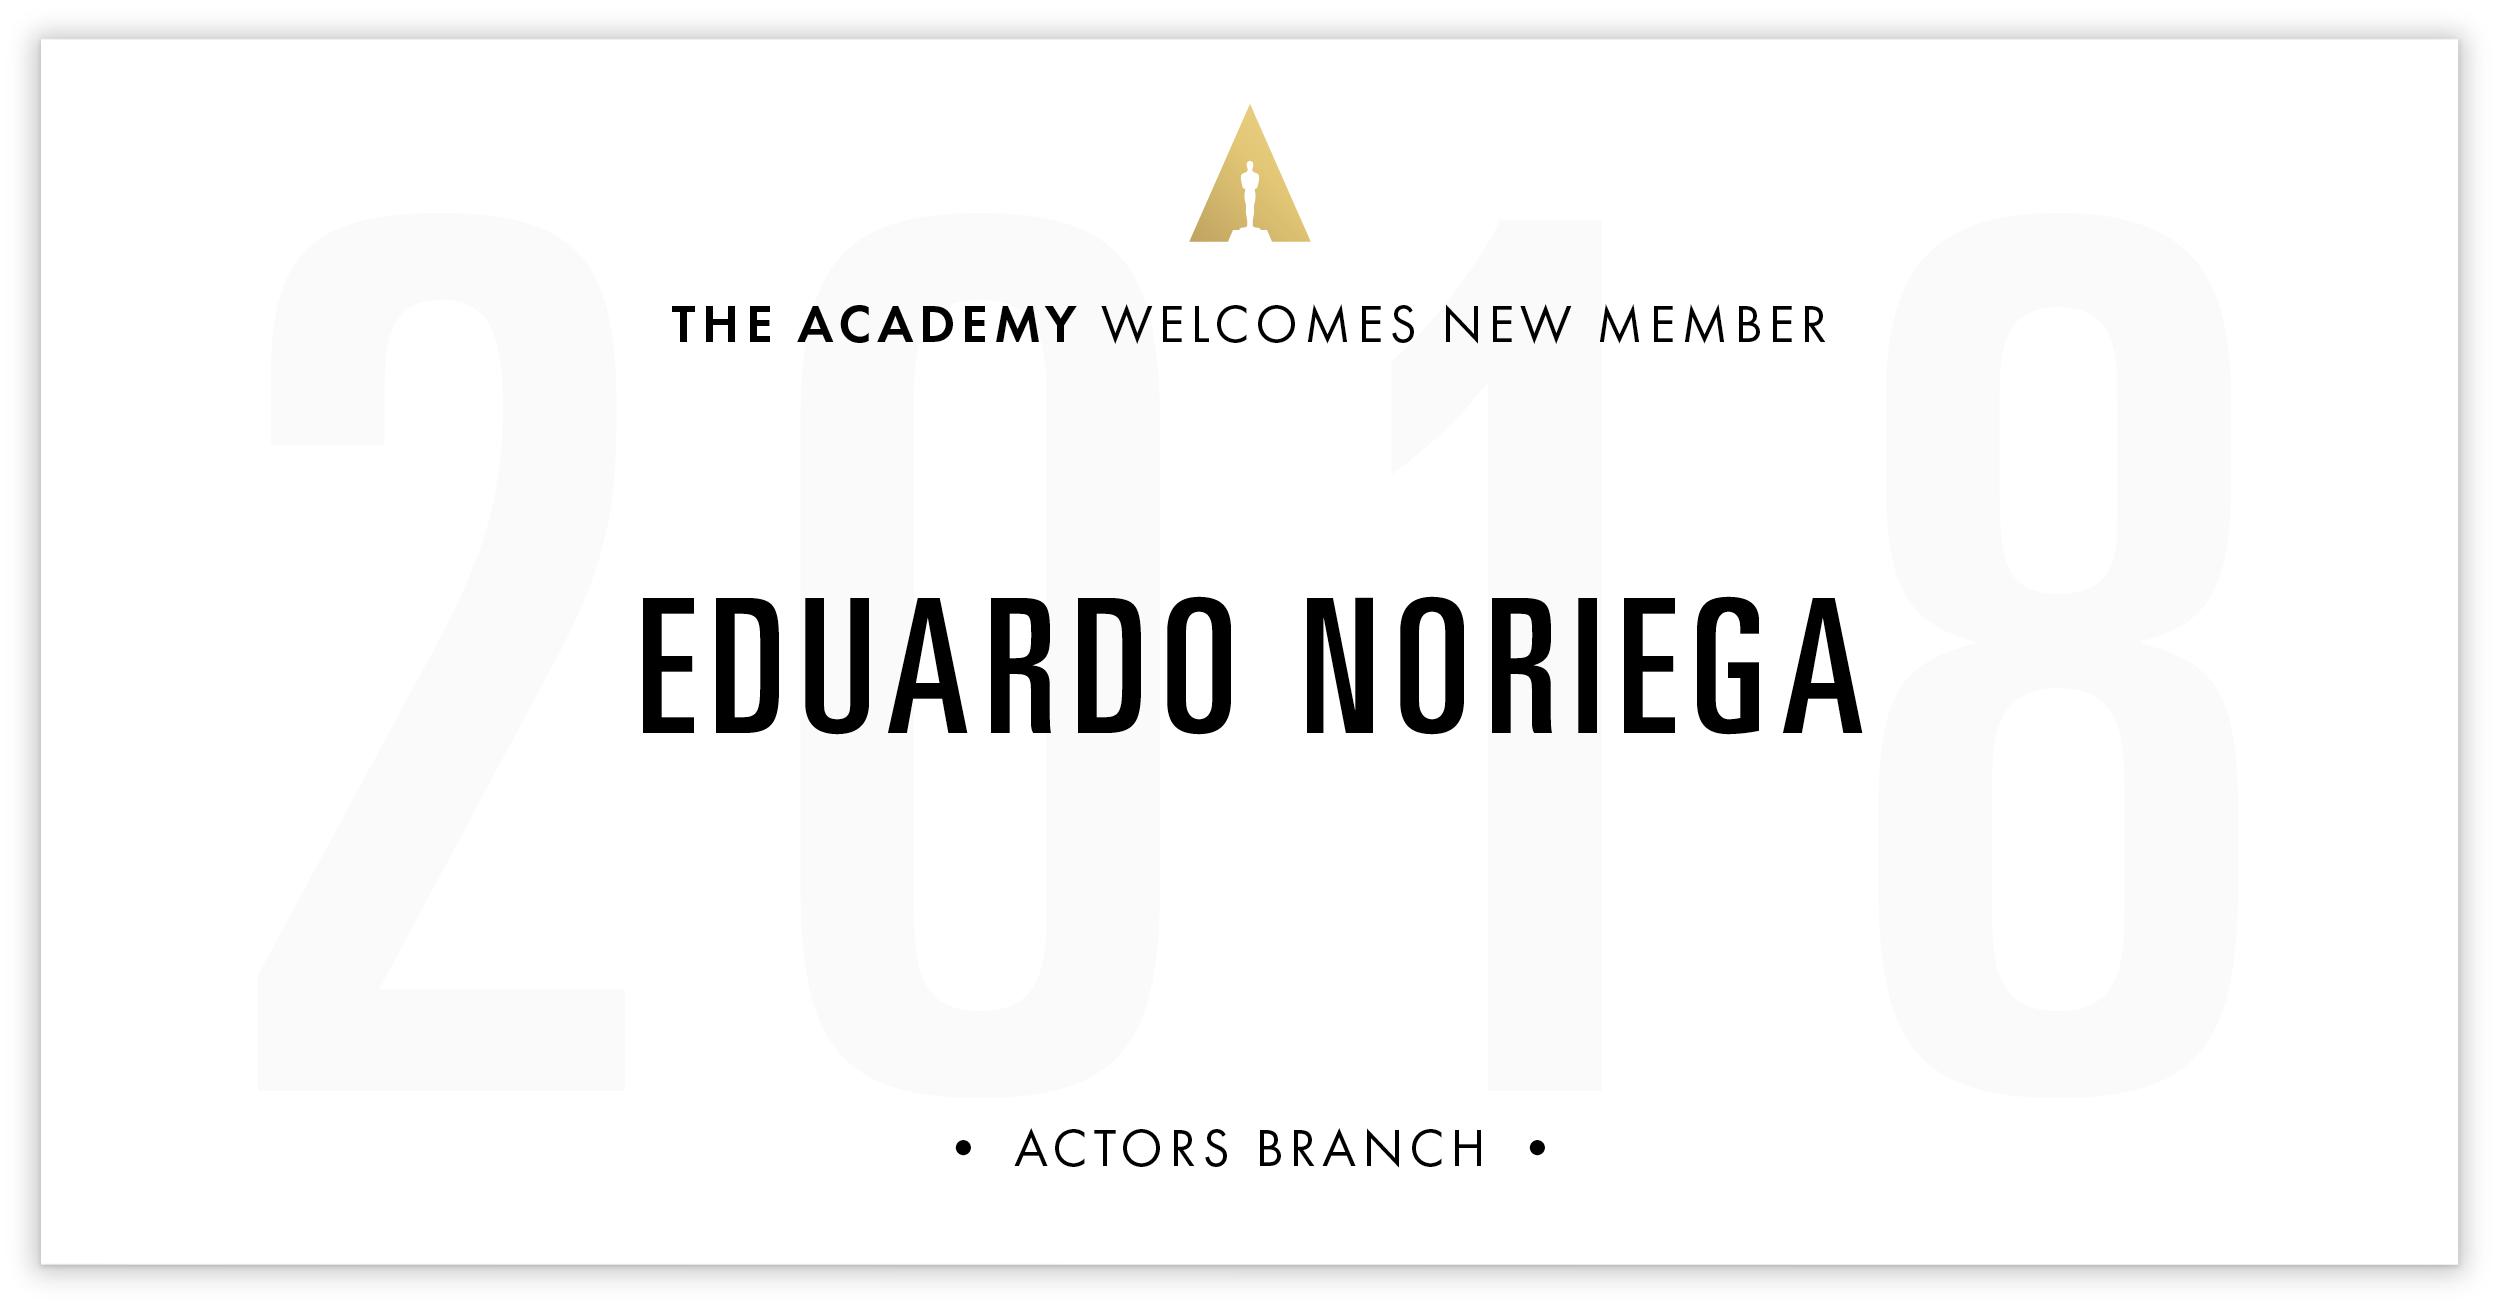 Eduardo Noriega is invited!